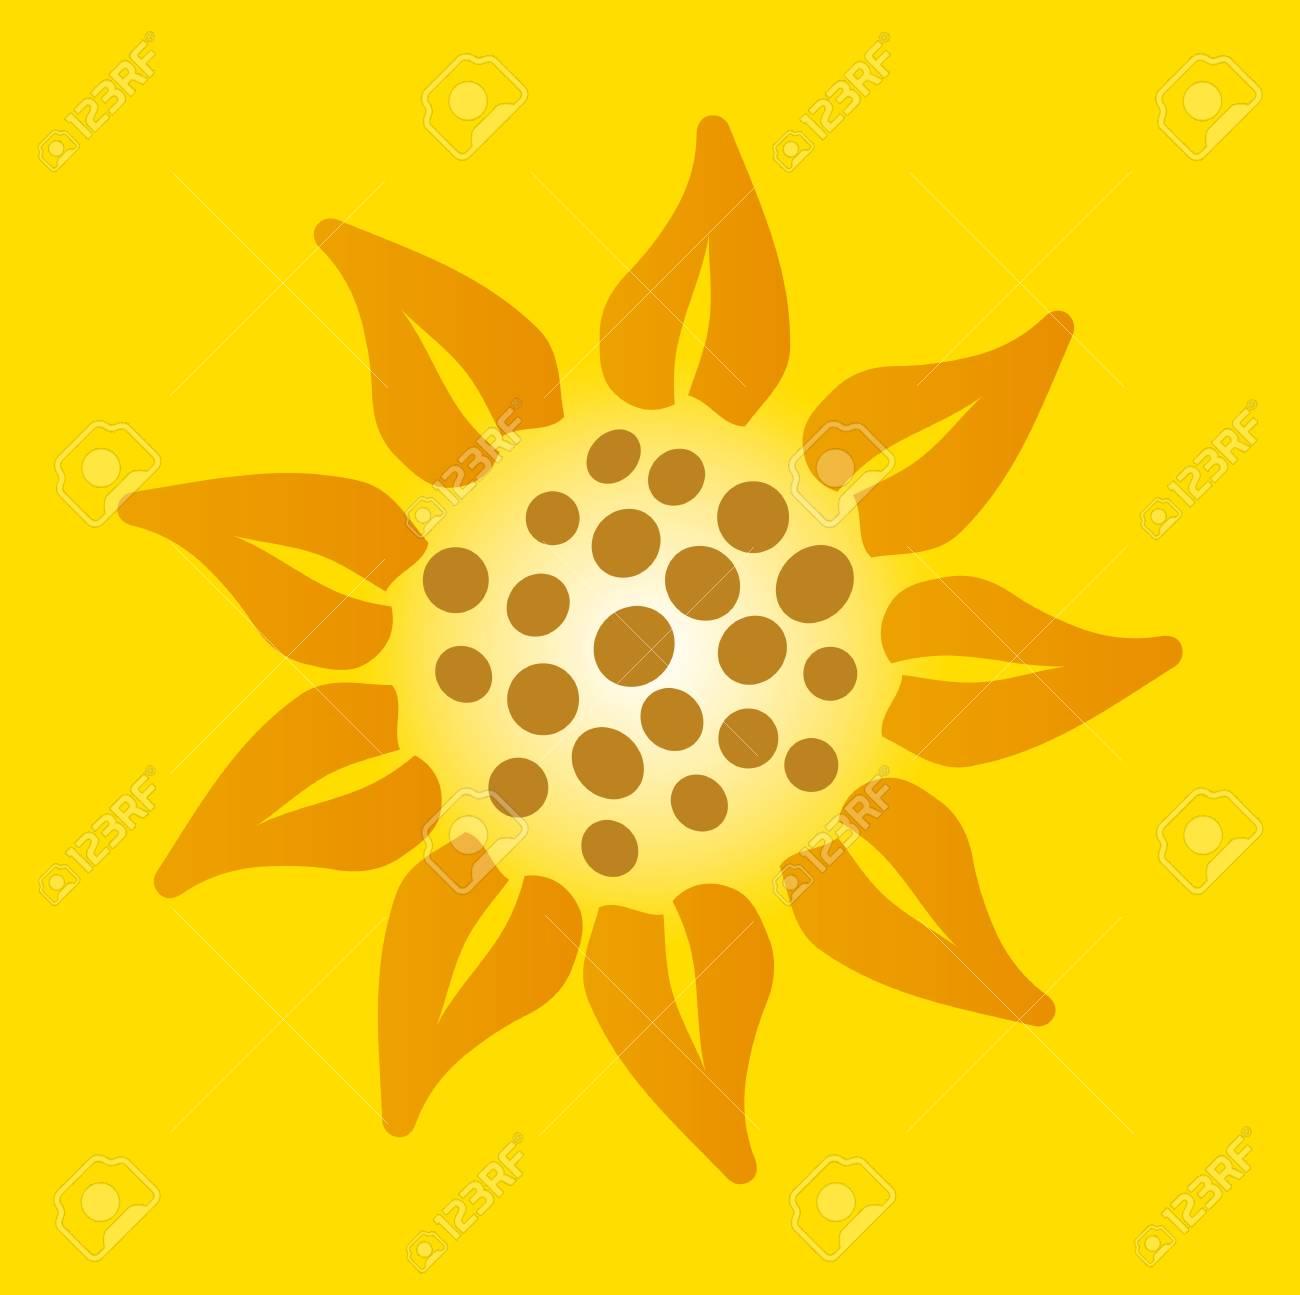 illustration of a sunflower Stock Vector - 15159990